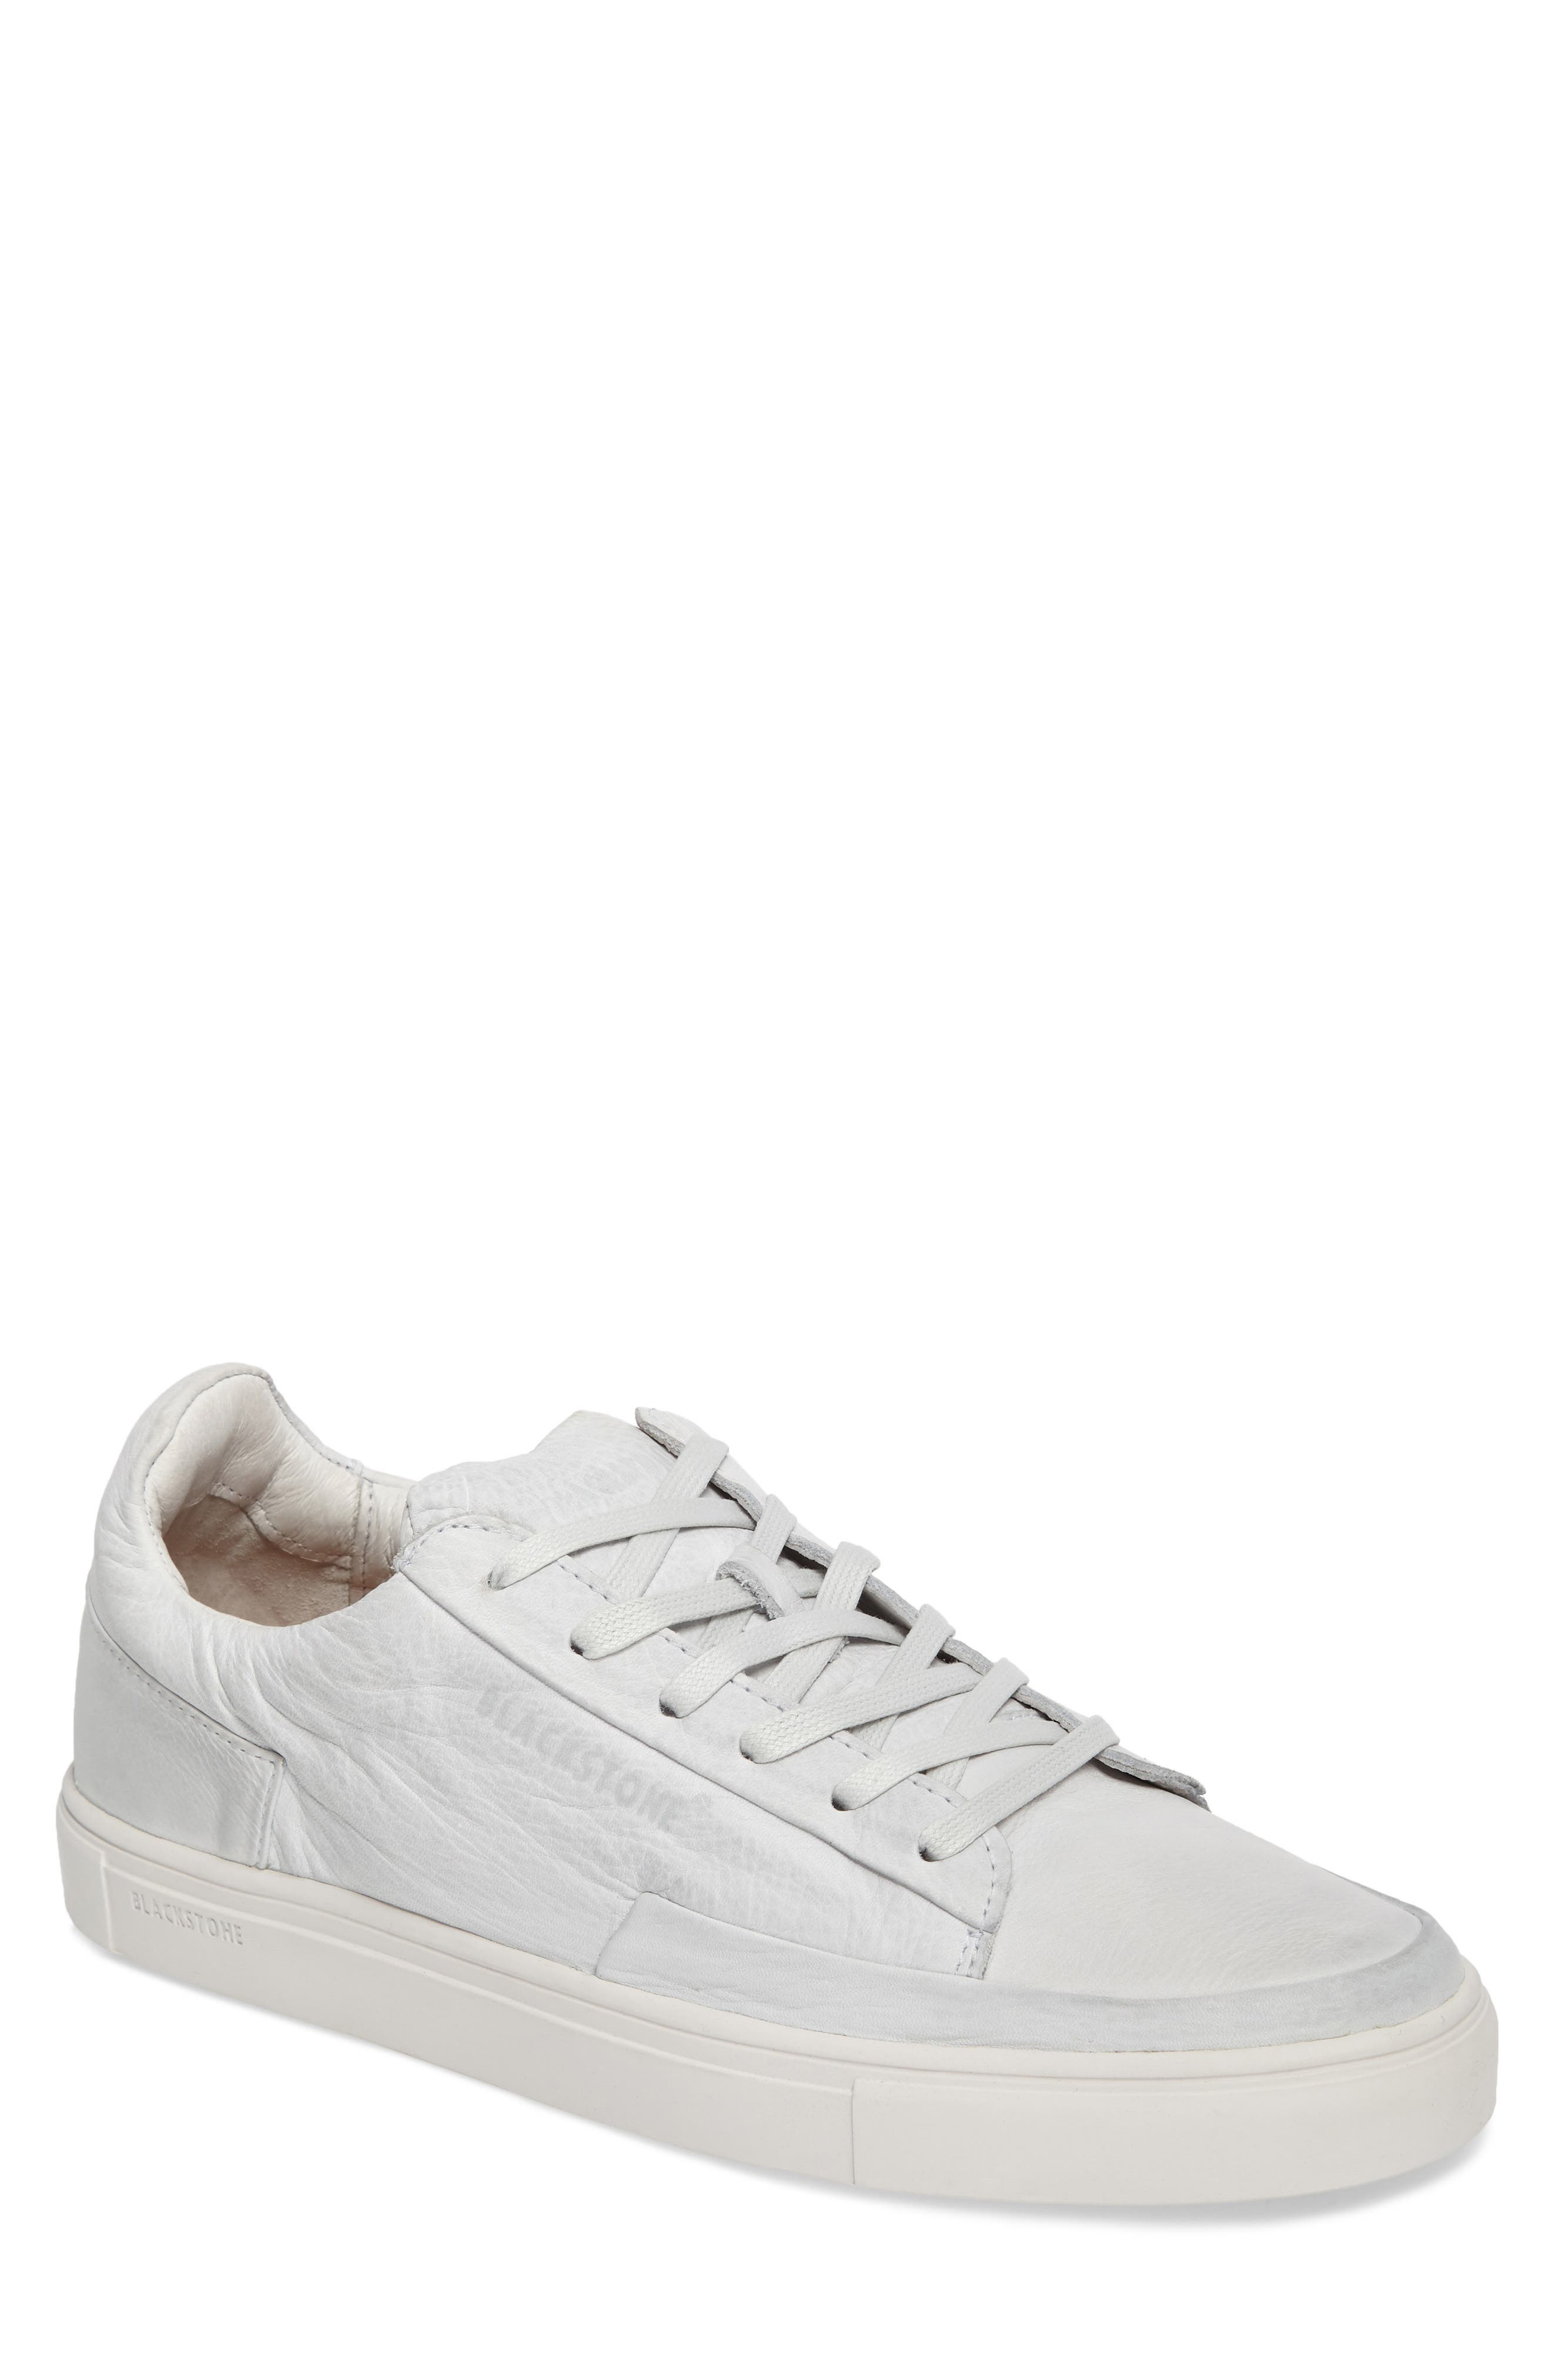 'KM01' Sneaker,                             Main thumbnail 1, color,                             100